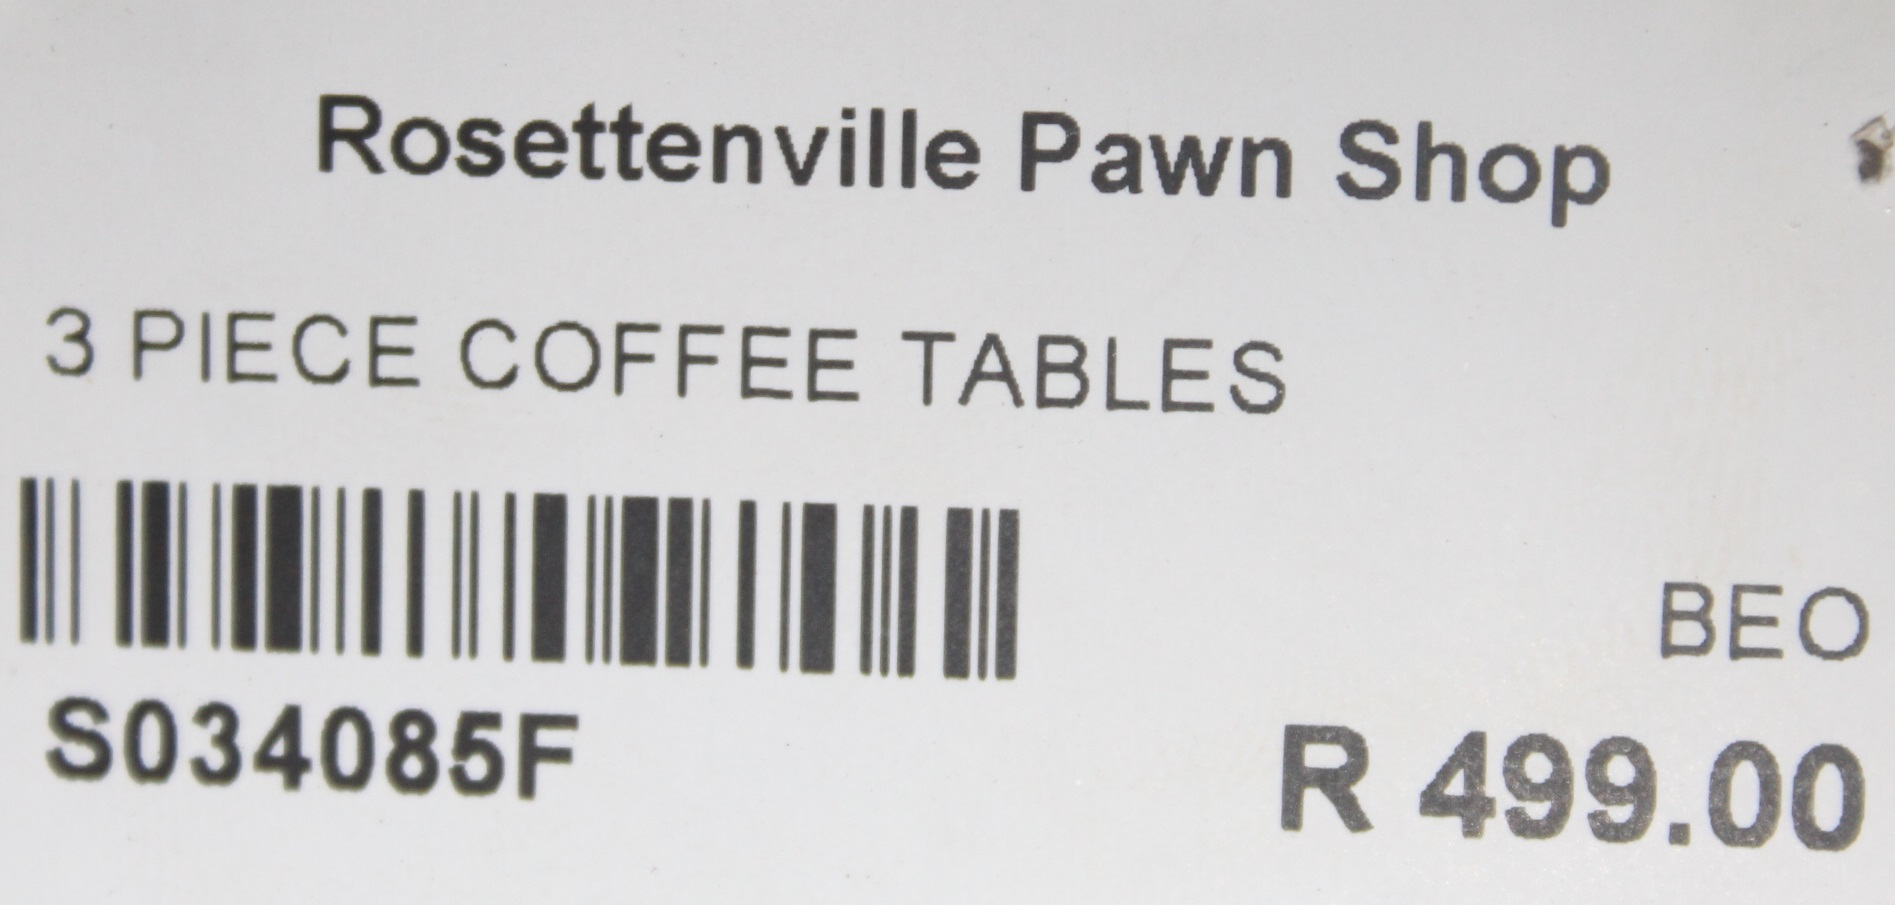 S034085F 3 Piece coffee tables #Rosettenvillepawnshop